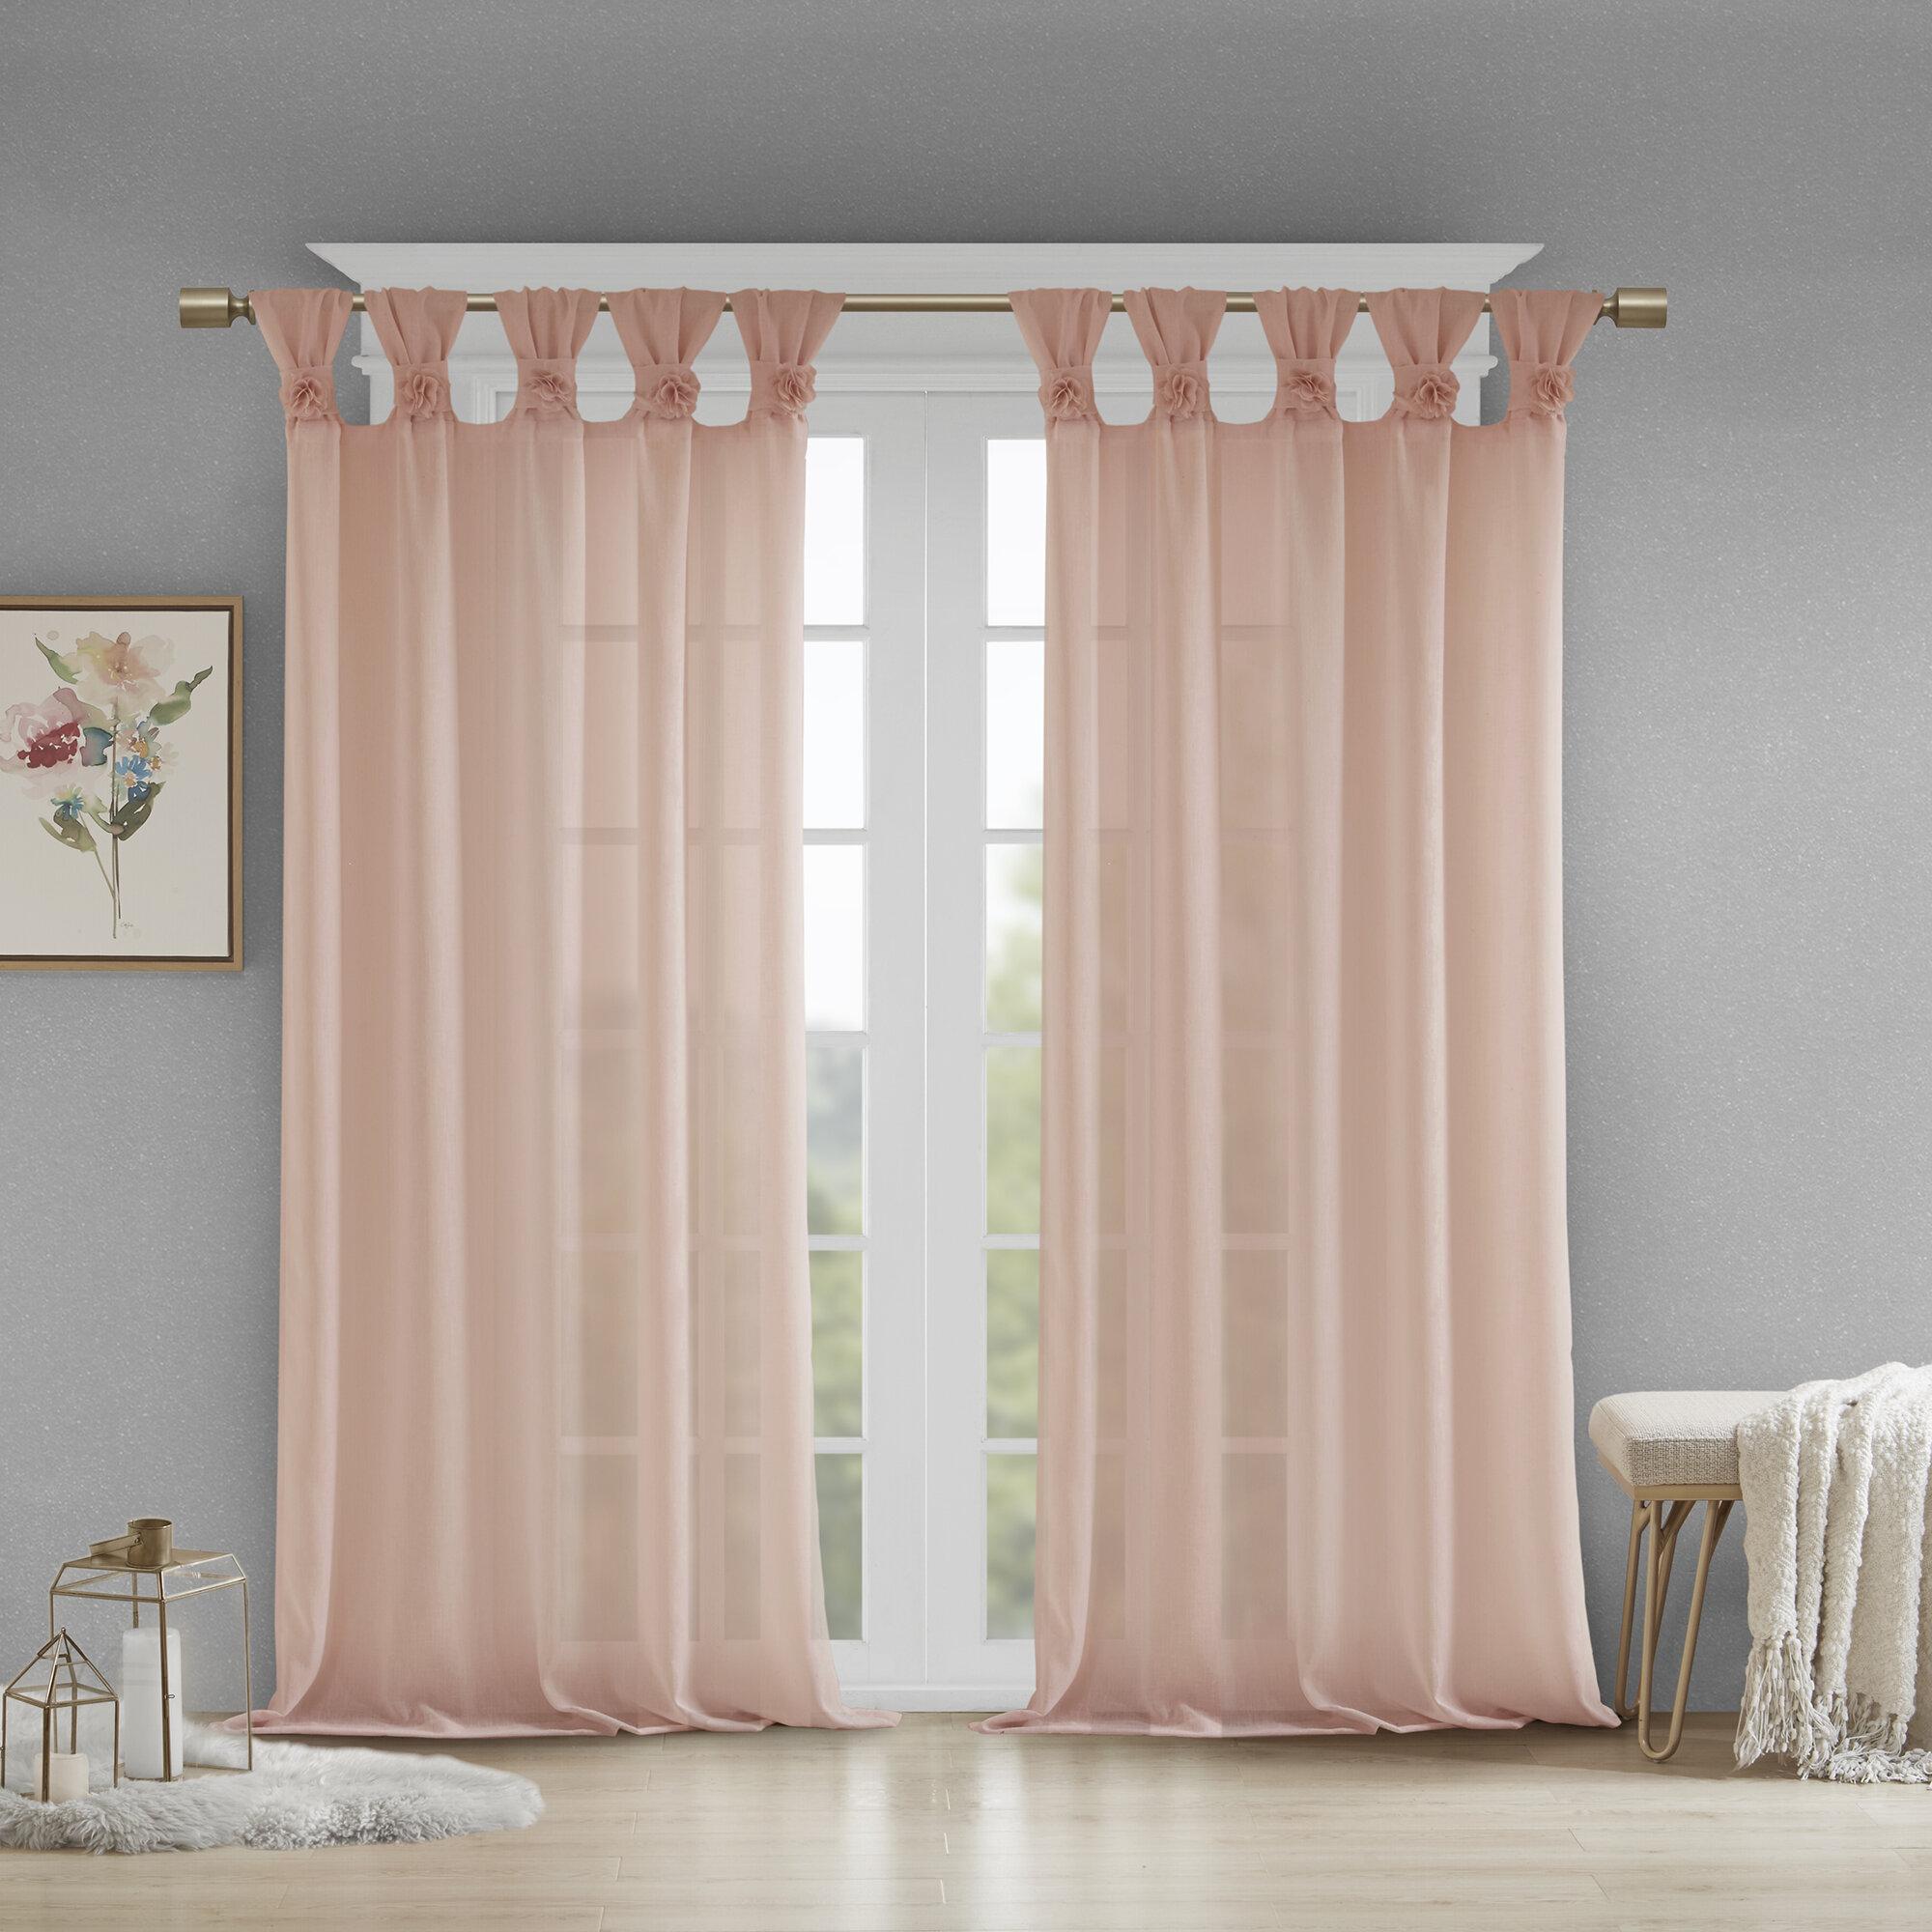 Farmhouse Rustic Semi Sheer Curtains Drapes Birch Lane